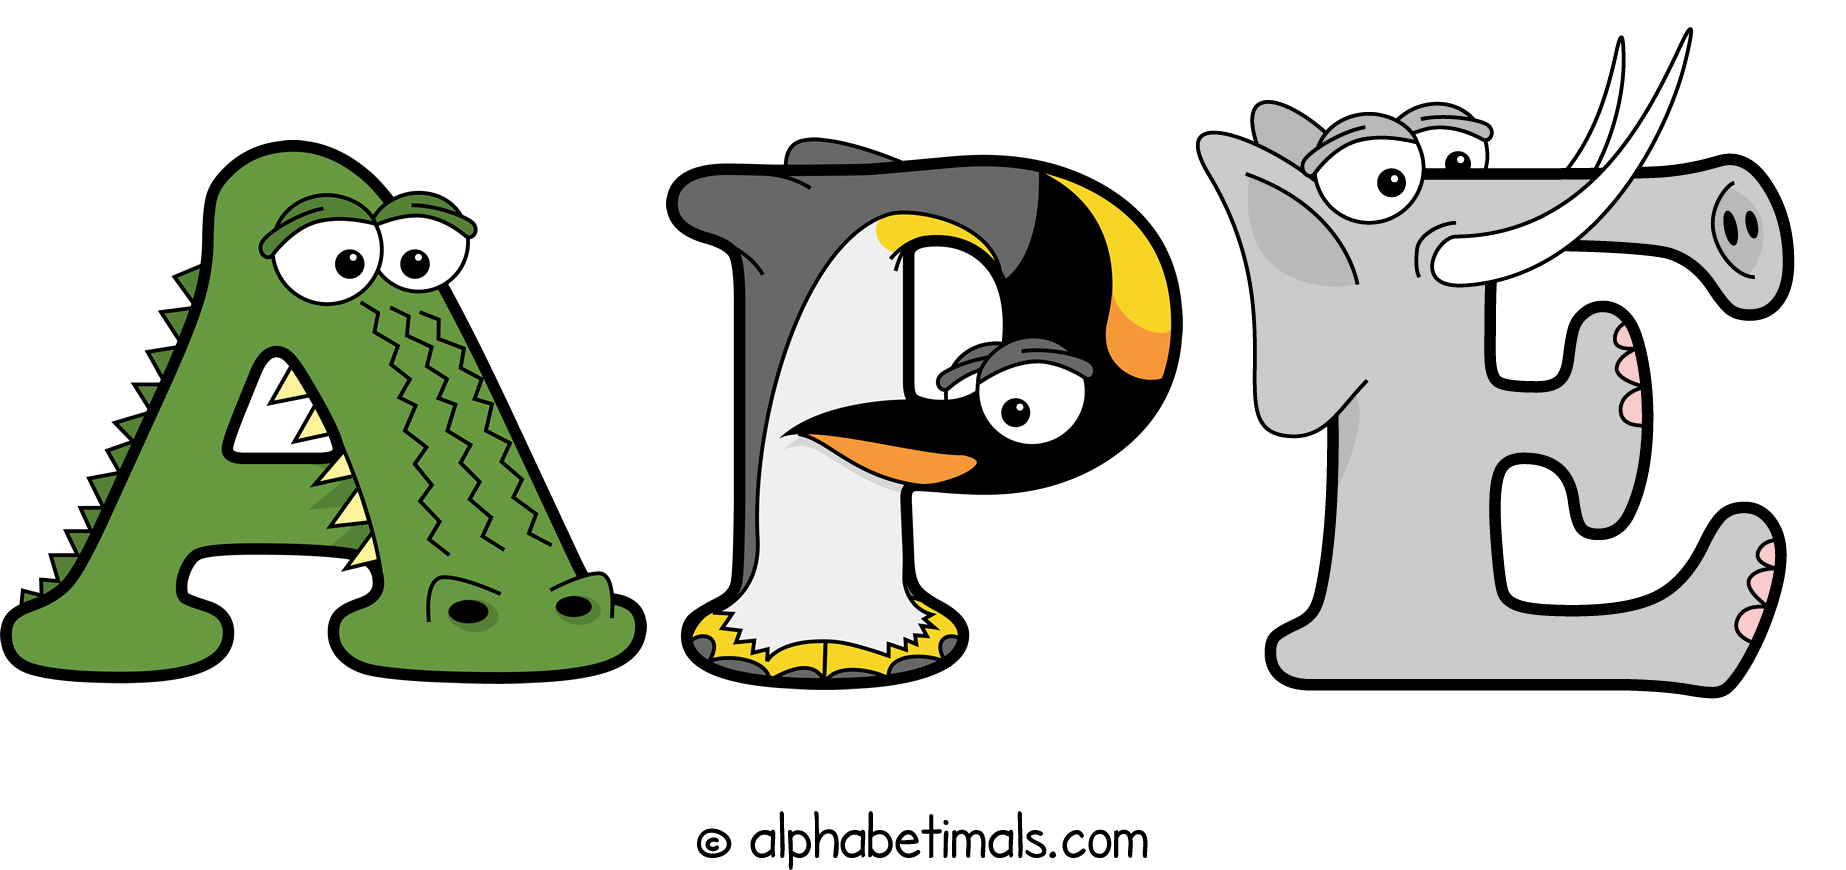 The word APE written in cute cartoon animal drawings